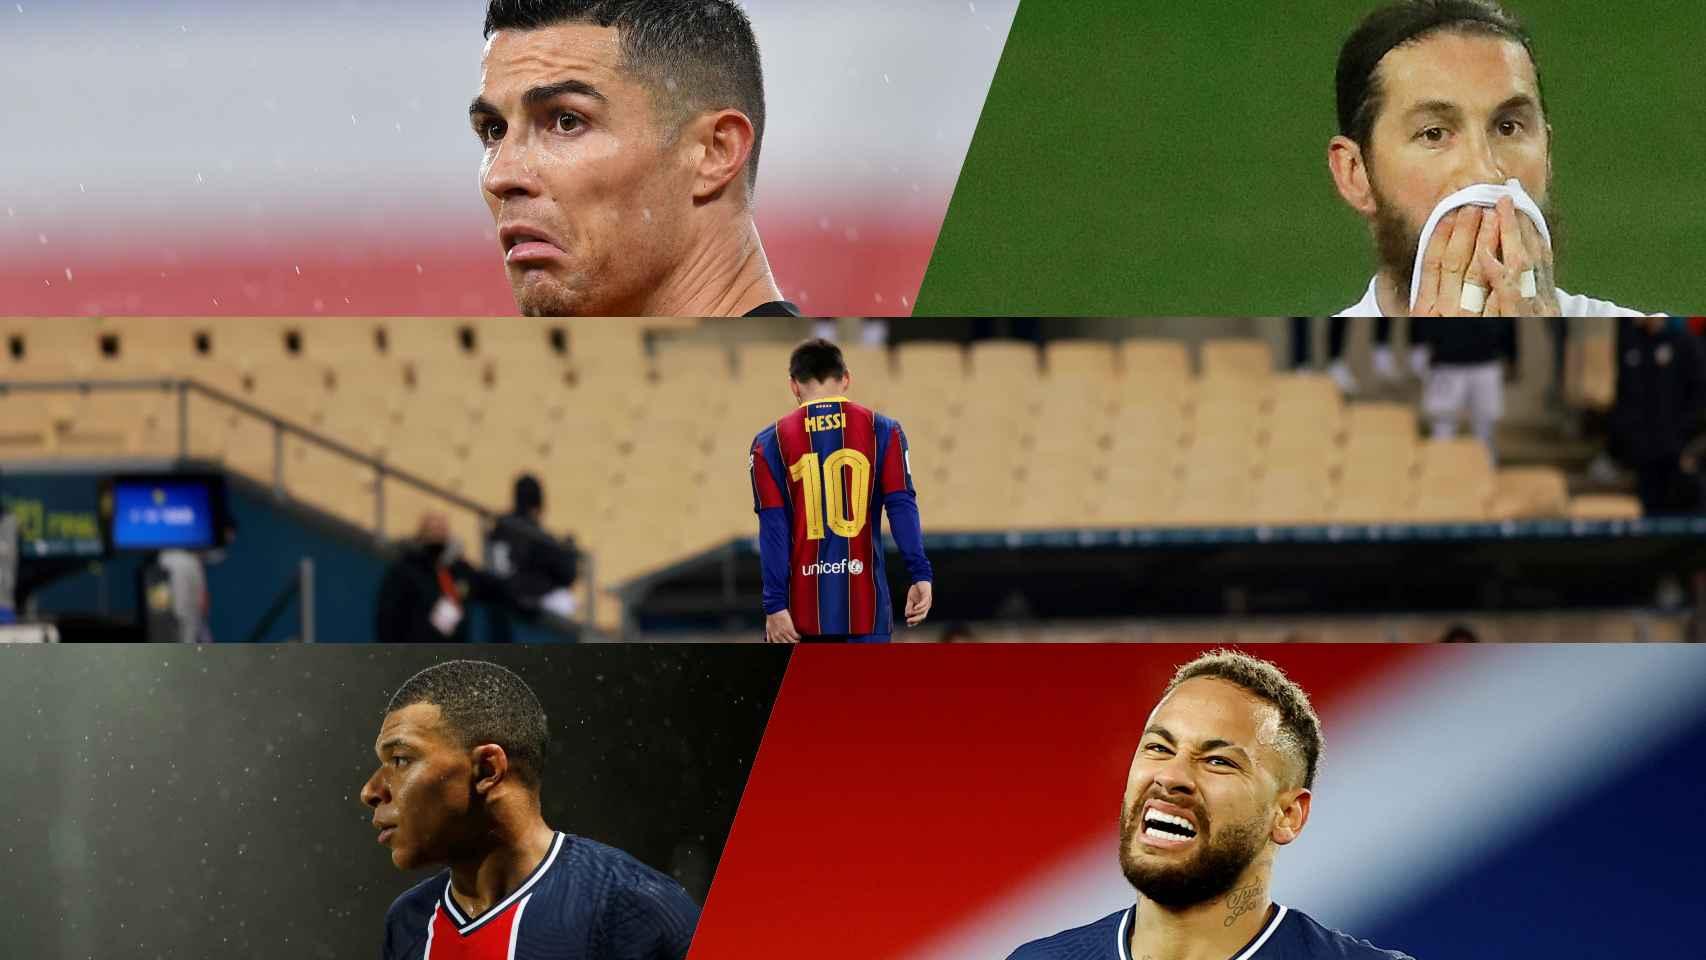 Cristiano Ronaldo, Sergio Ramos, Leo Messi, Kylian Mbappé y Neymar, en un fotomontaje